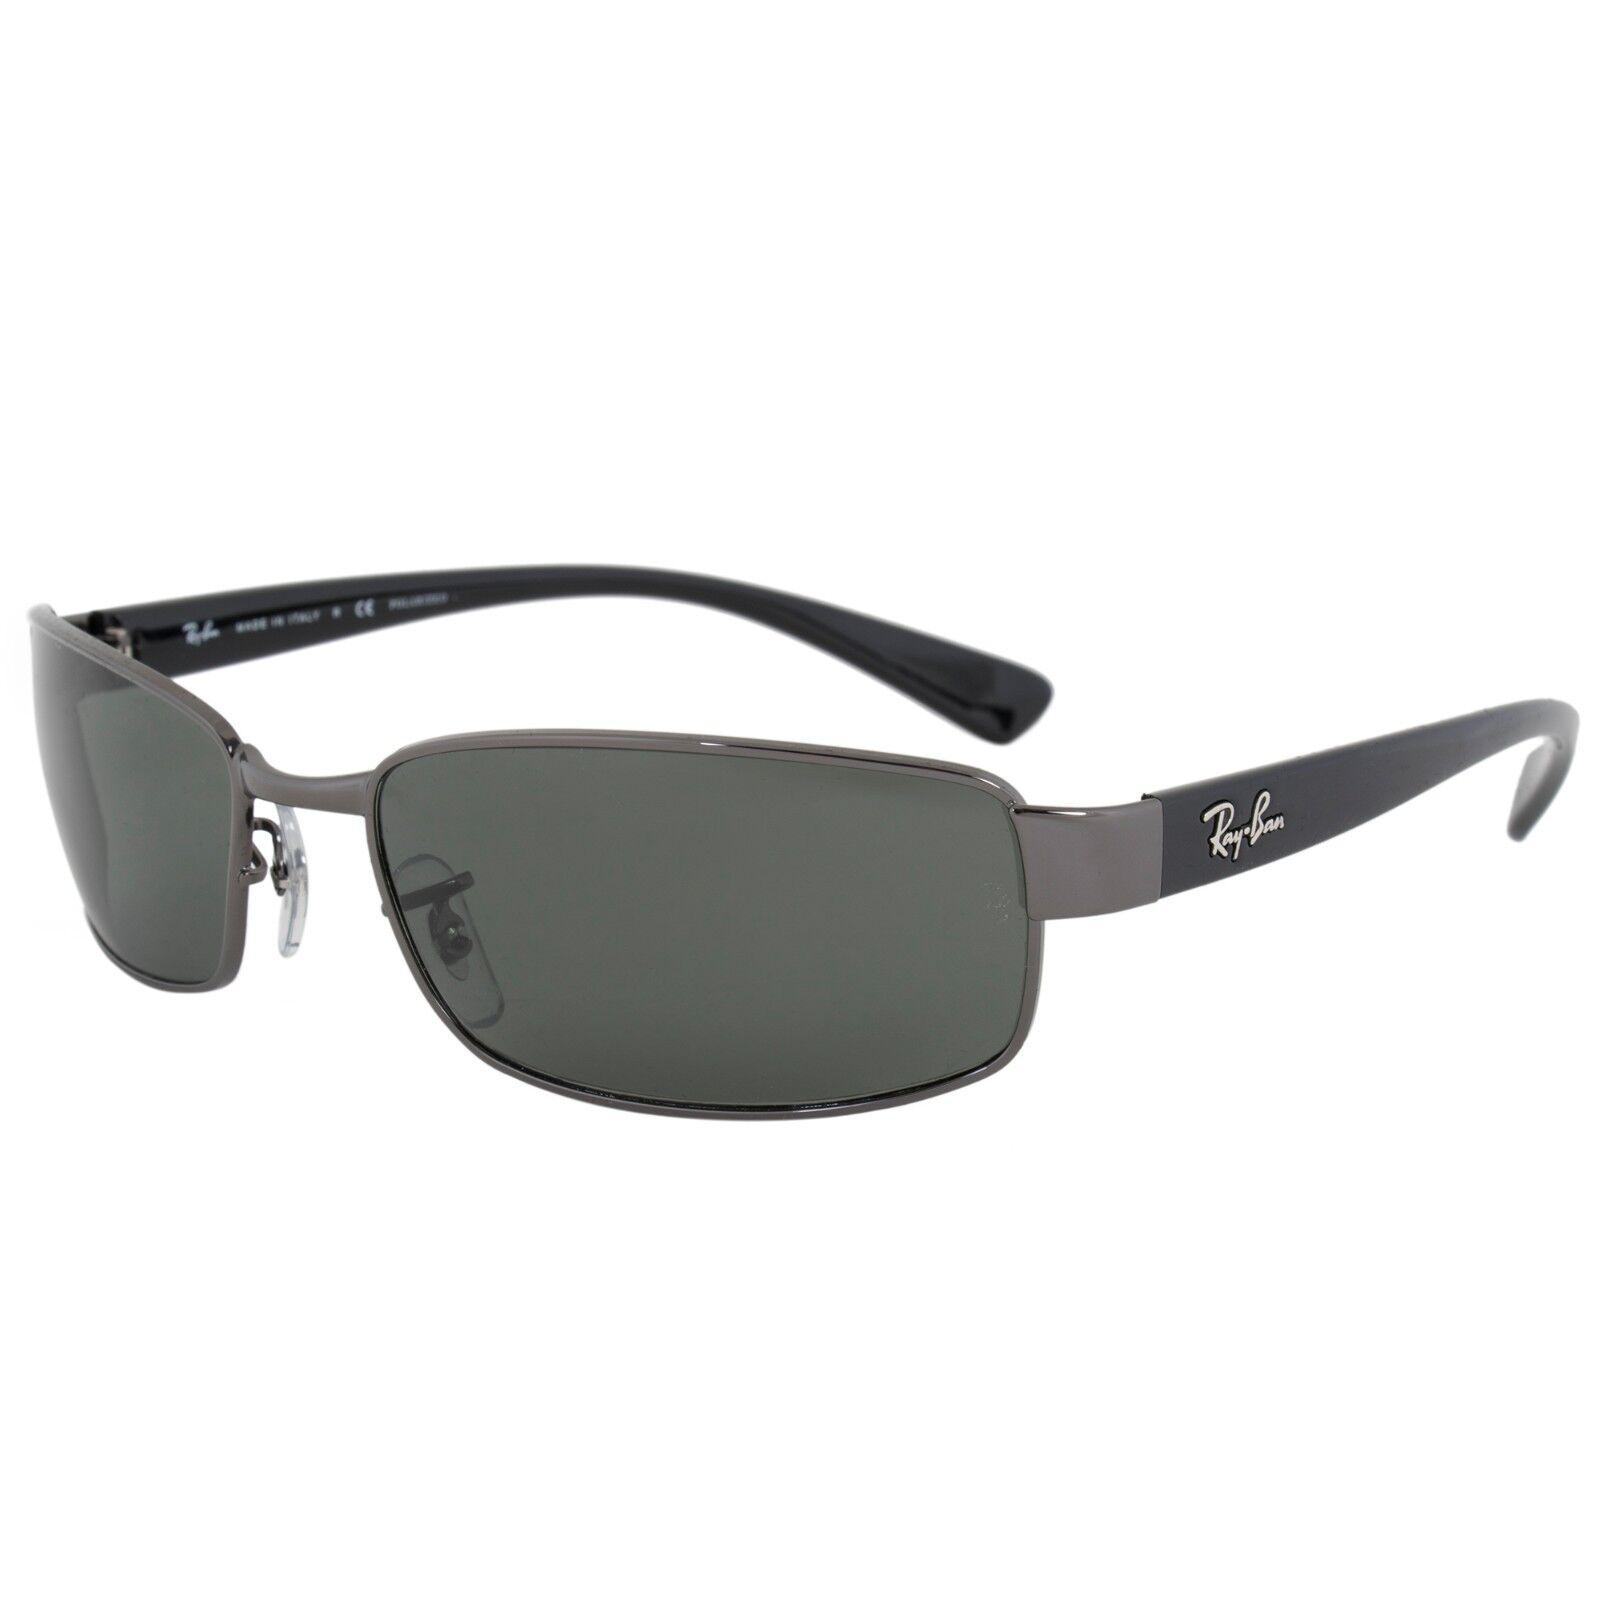 1b4841081b6 ... Gunmetal Black Rectangular UPC 805289161110 product image for Ray Ban  Rectangle Sunglasses Rb3364 004 58 59 Pol